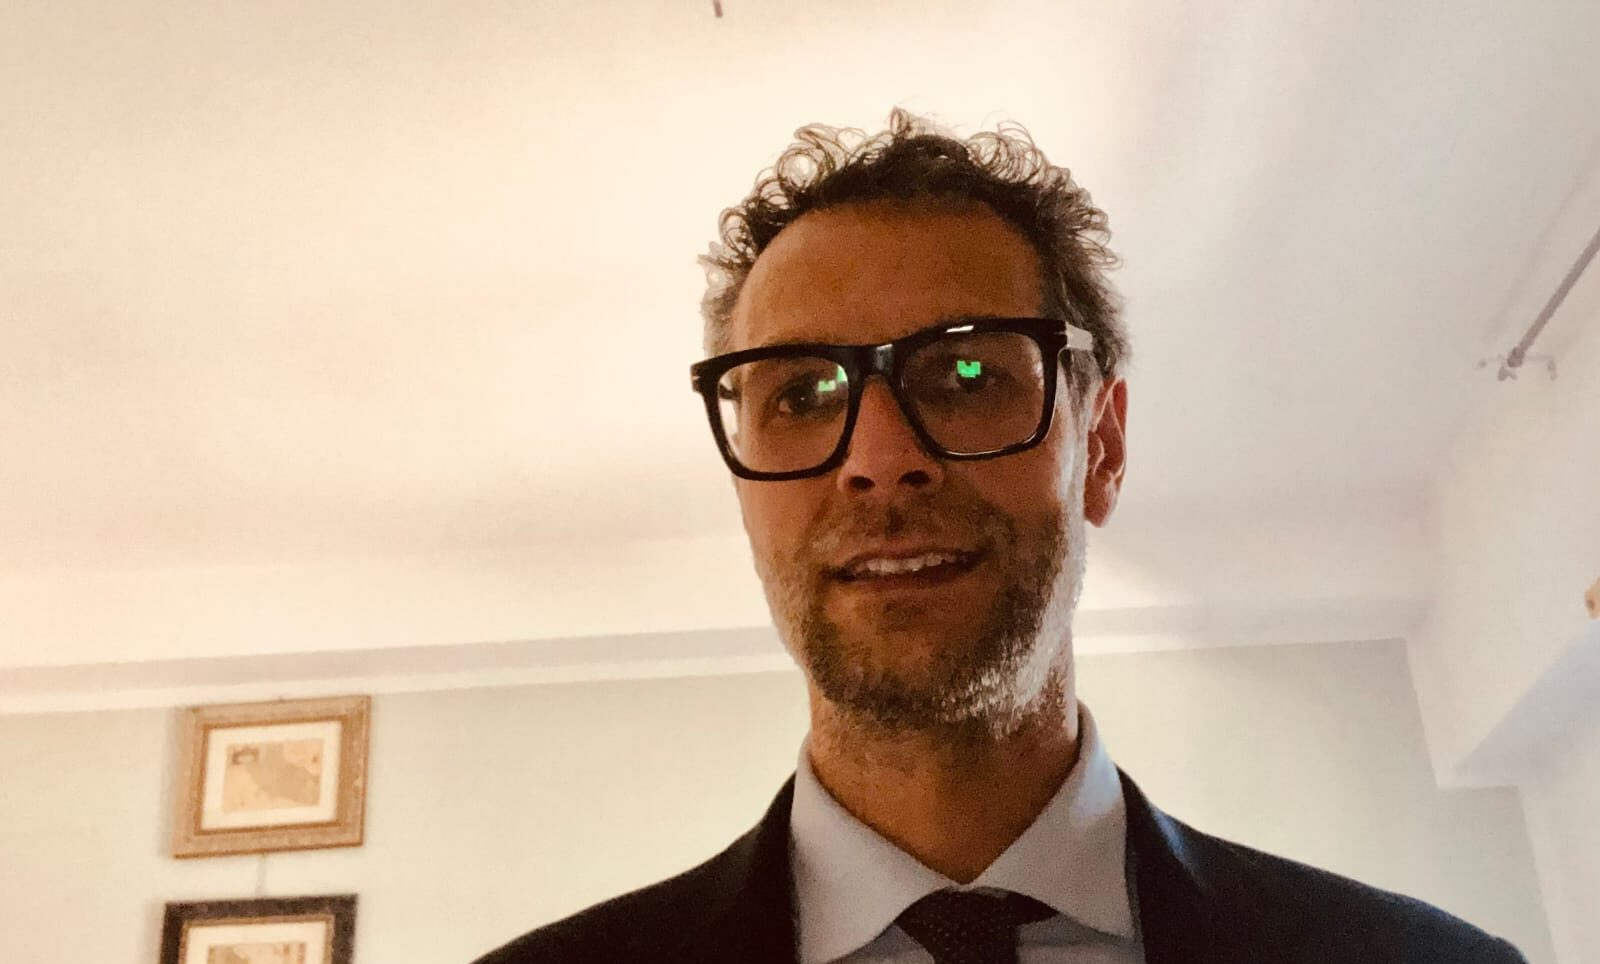 L'imprenditore Gianluca Stornelli